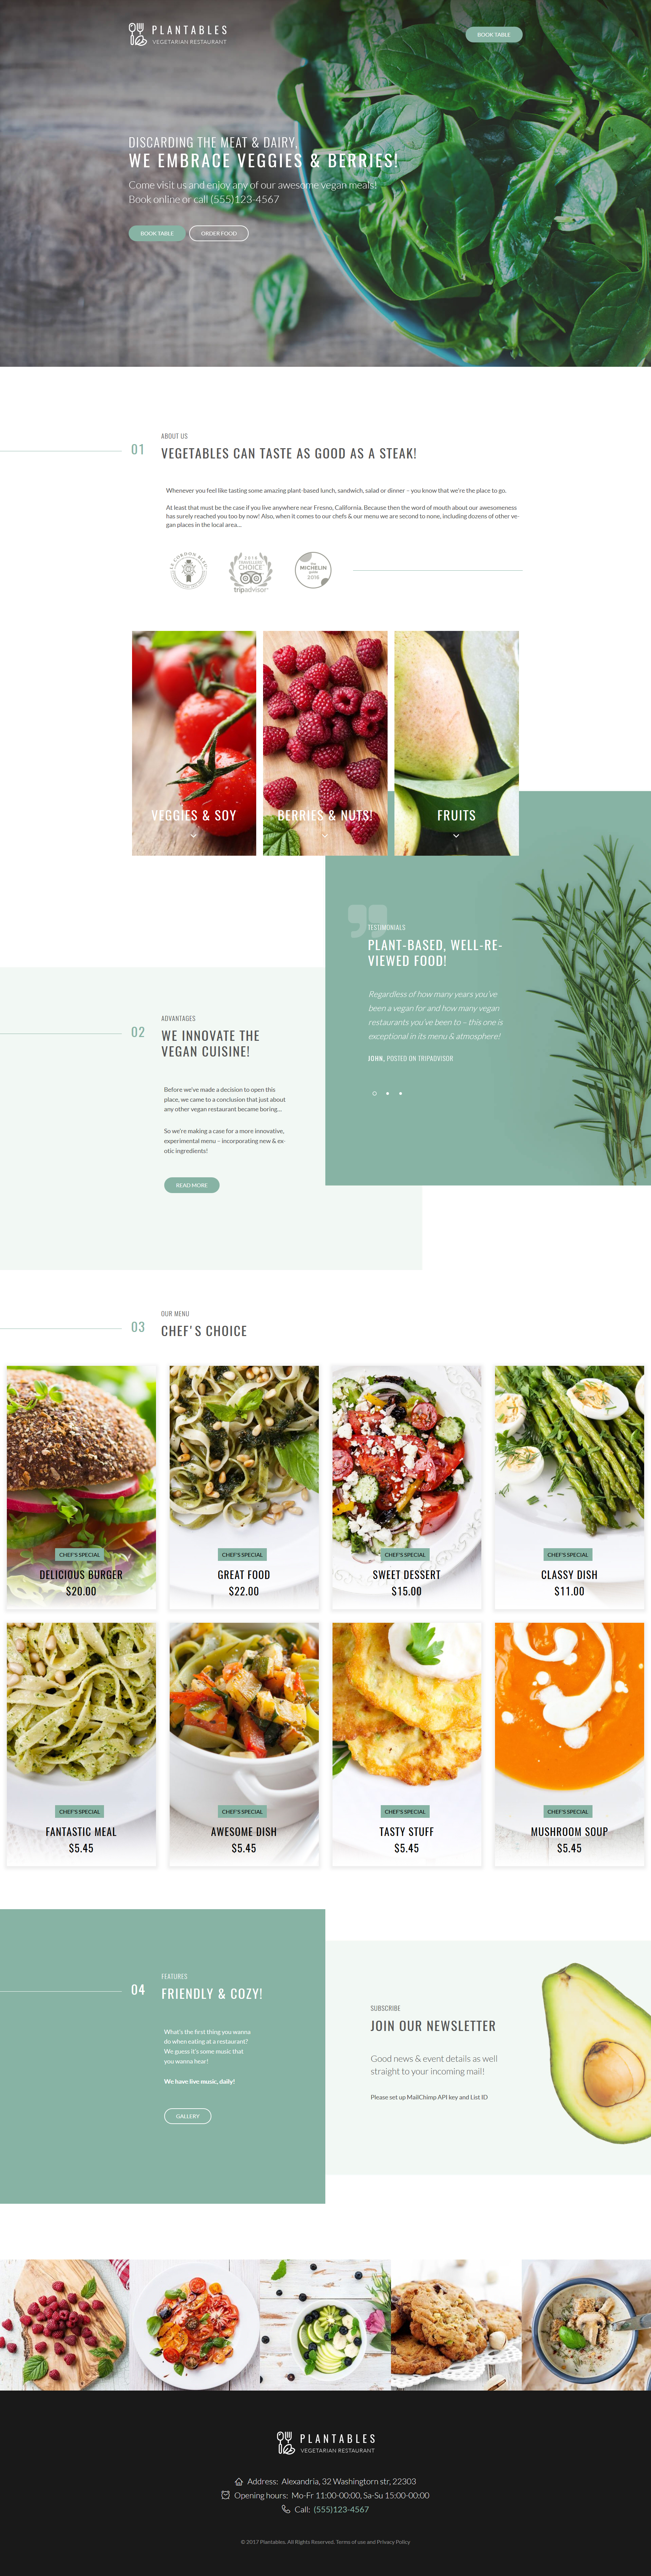 Plantables - Vegetarian Restaurant WordPress Theme - screenshot